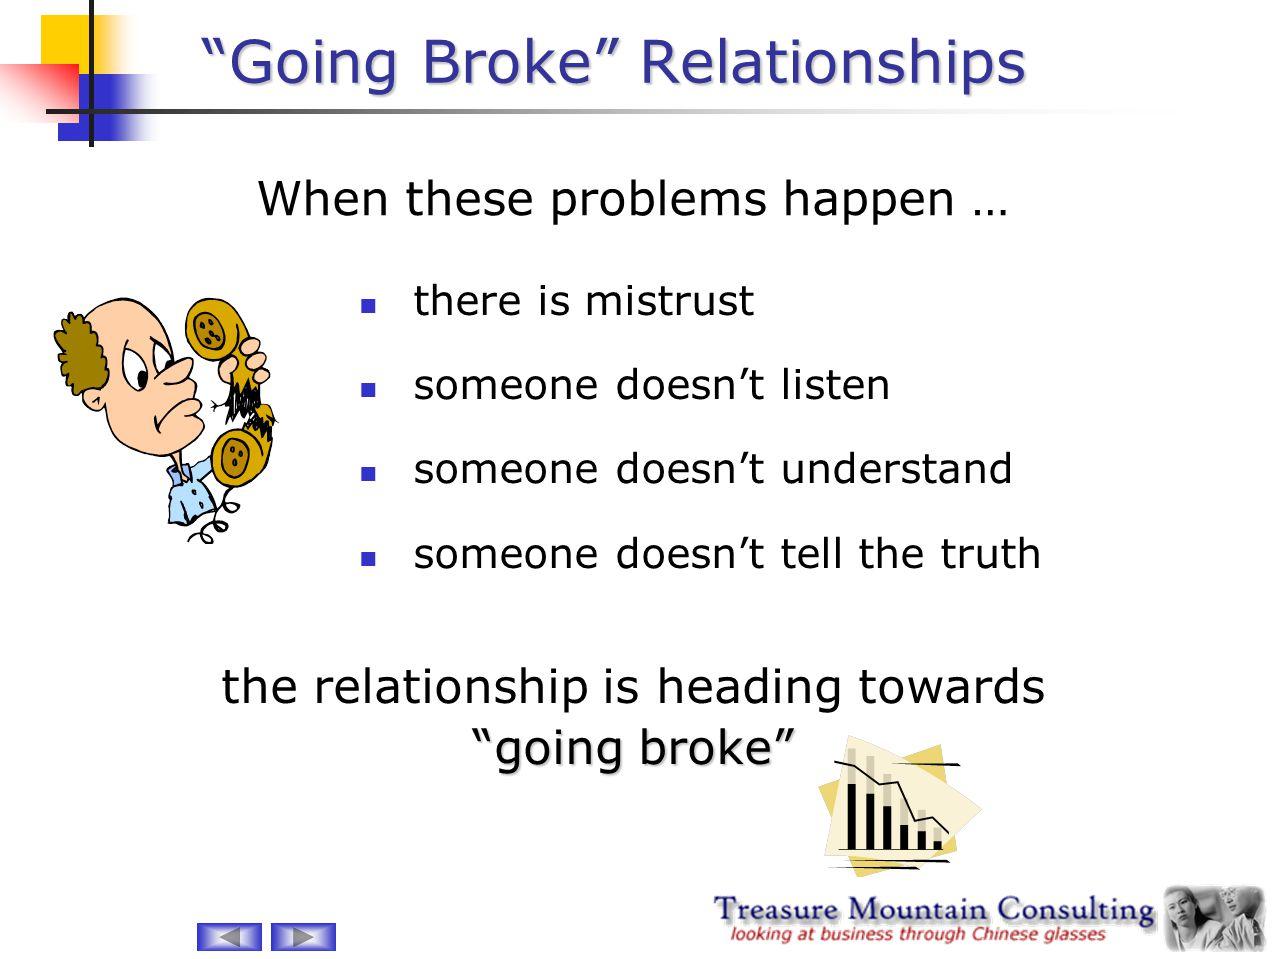 Going Broke Relationships